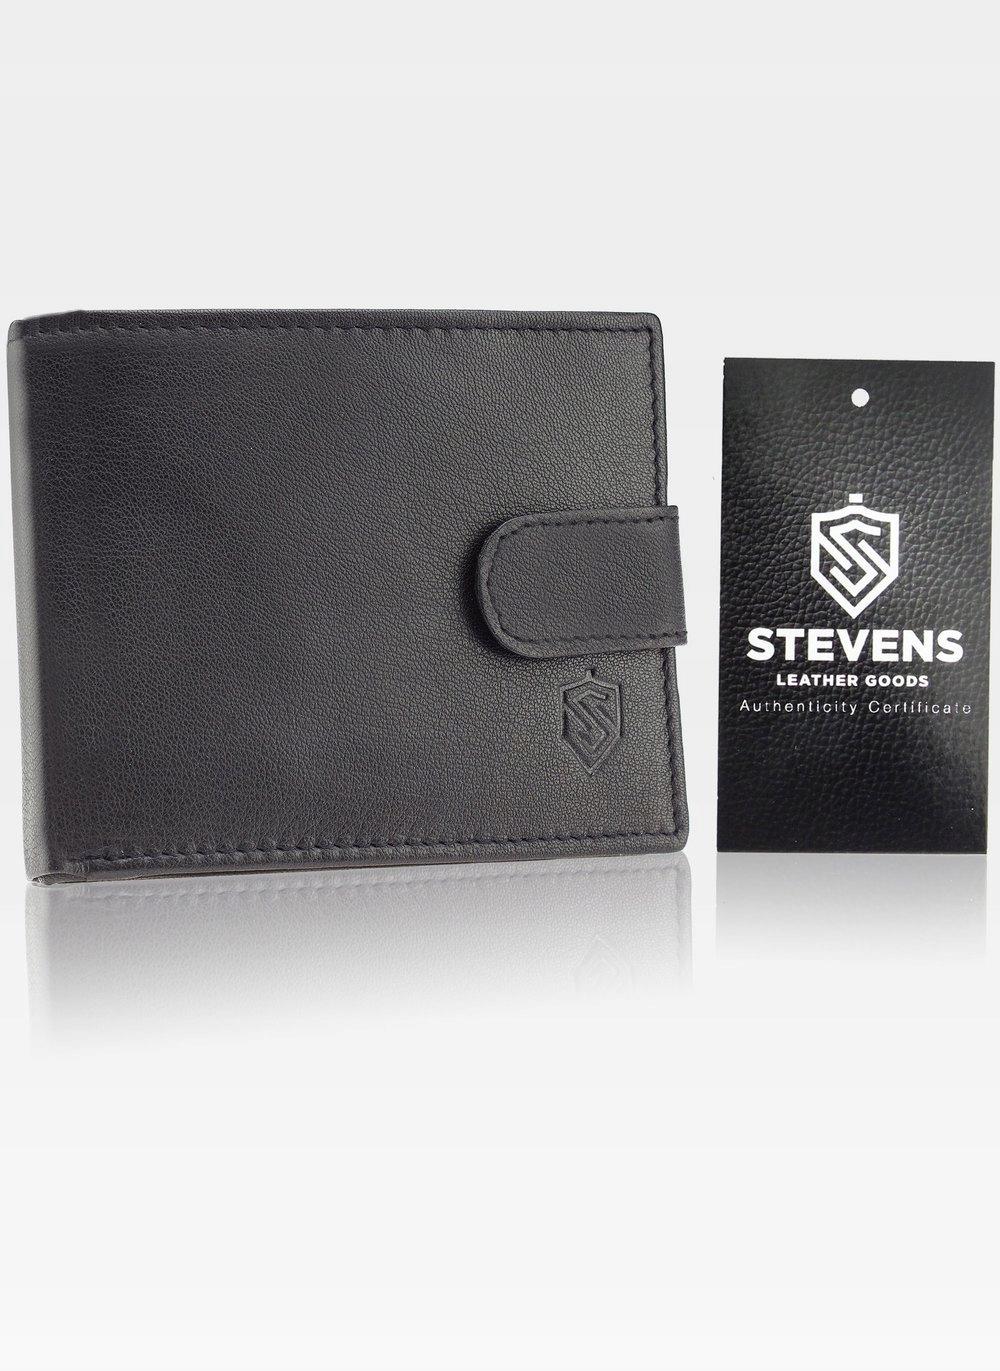 STEVENS GIFT SET. Wallet. Men's leather belt. The dominant logo pattern